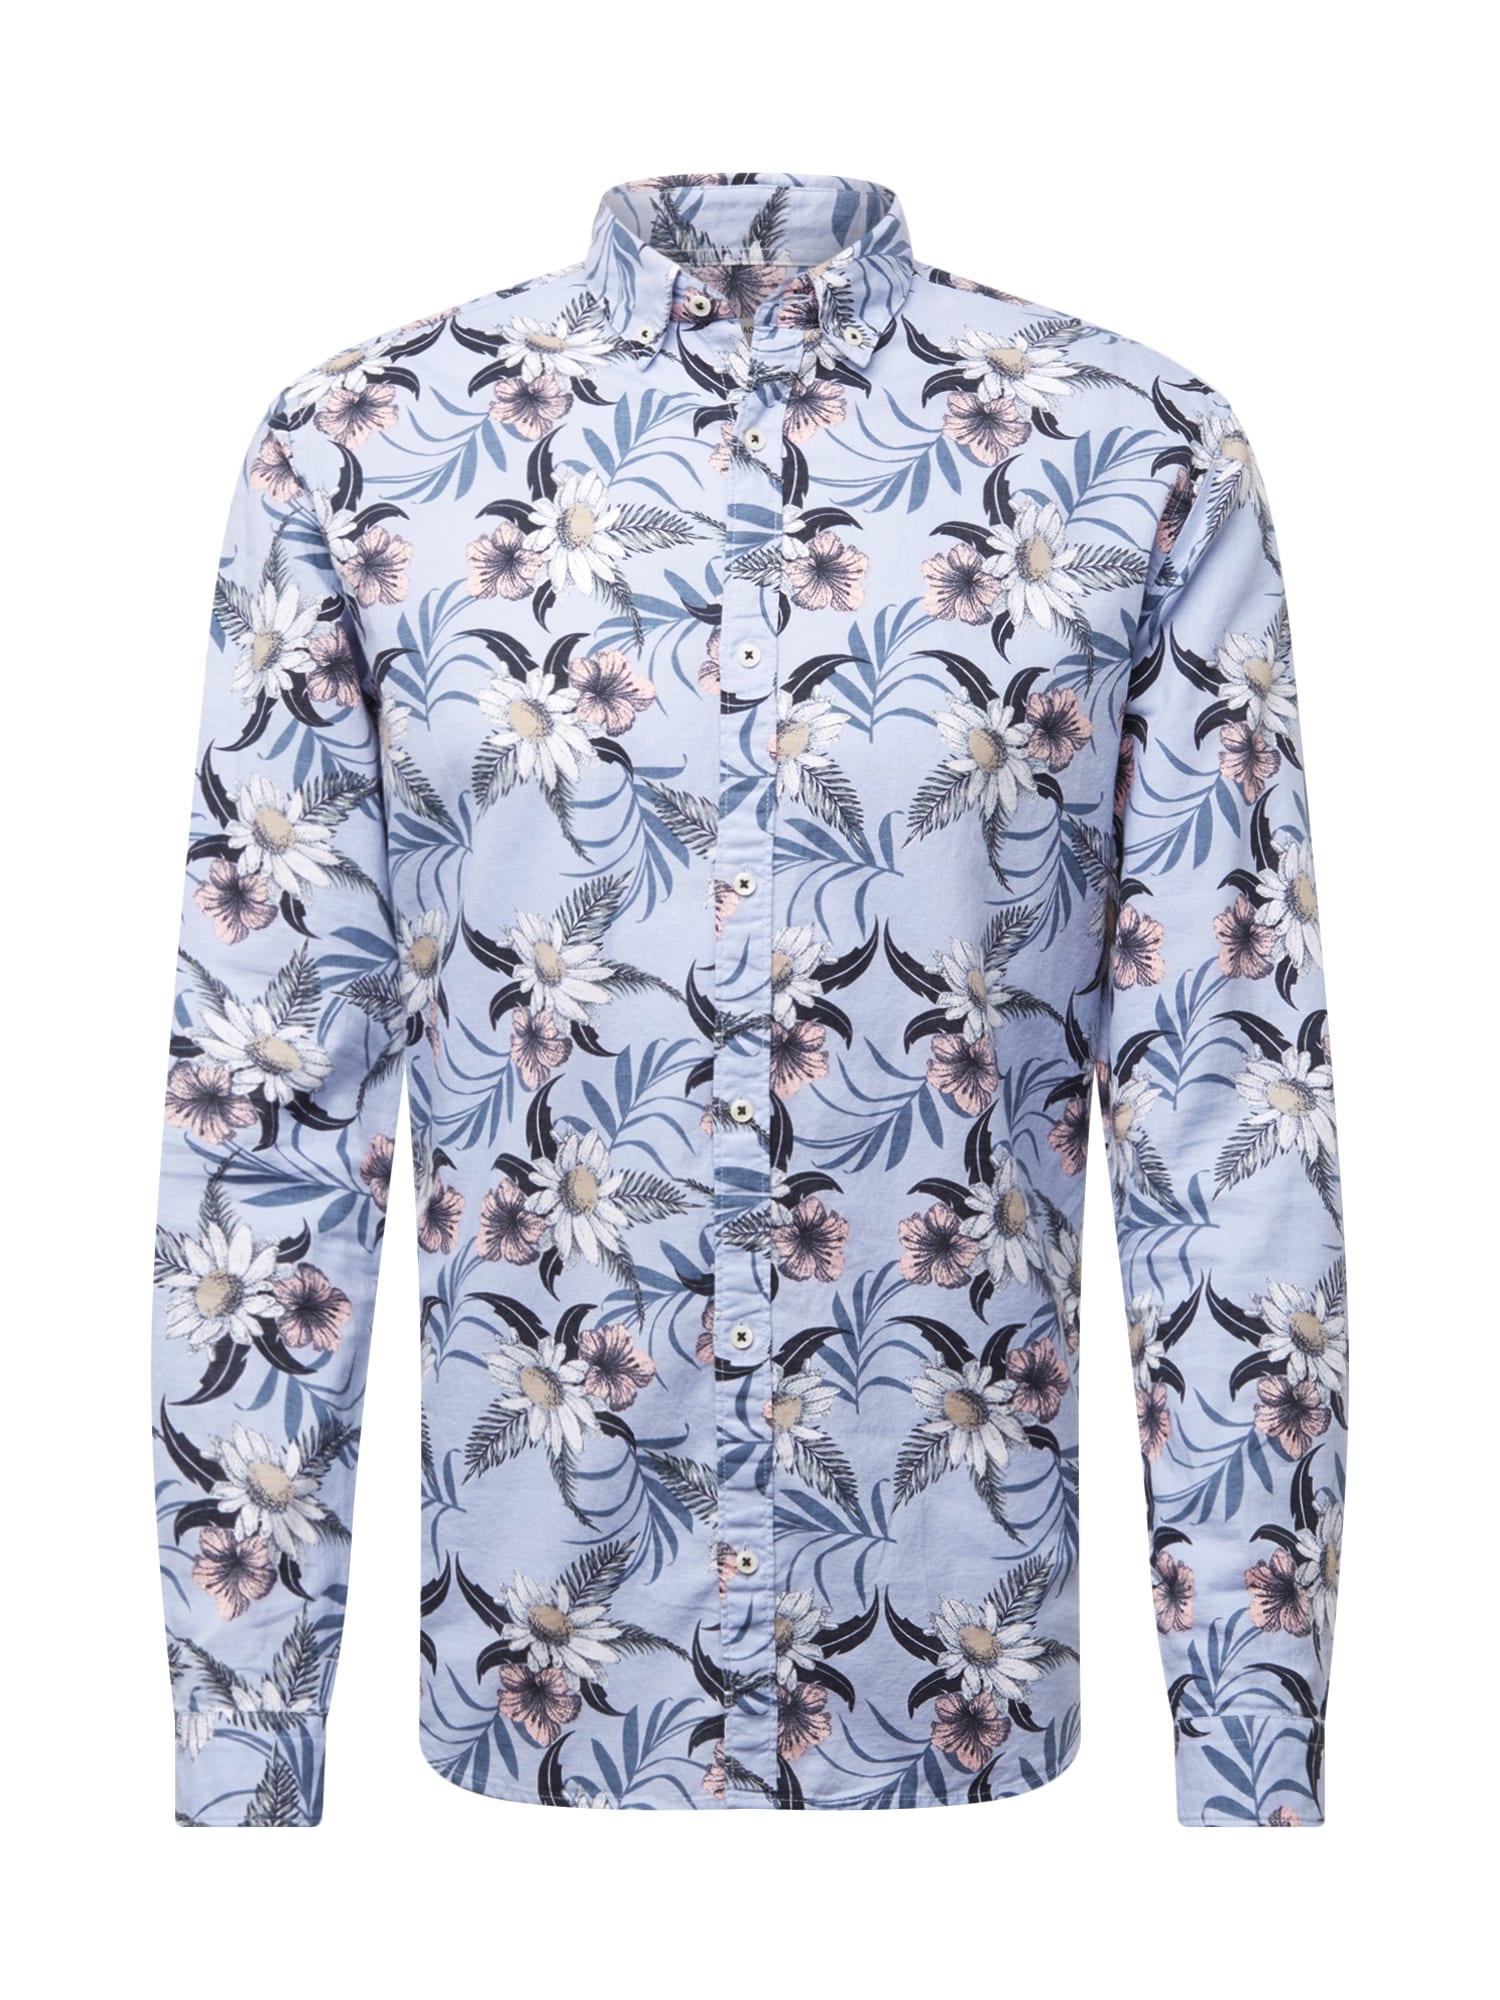 Košile SUMMER světlemodrá tmavě modrá růžová JACK & JONES